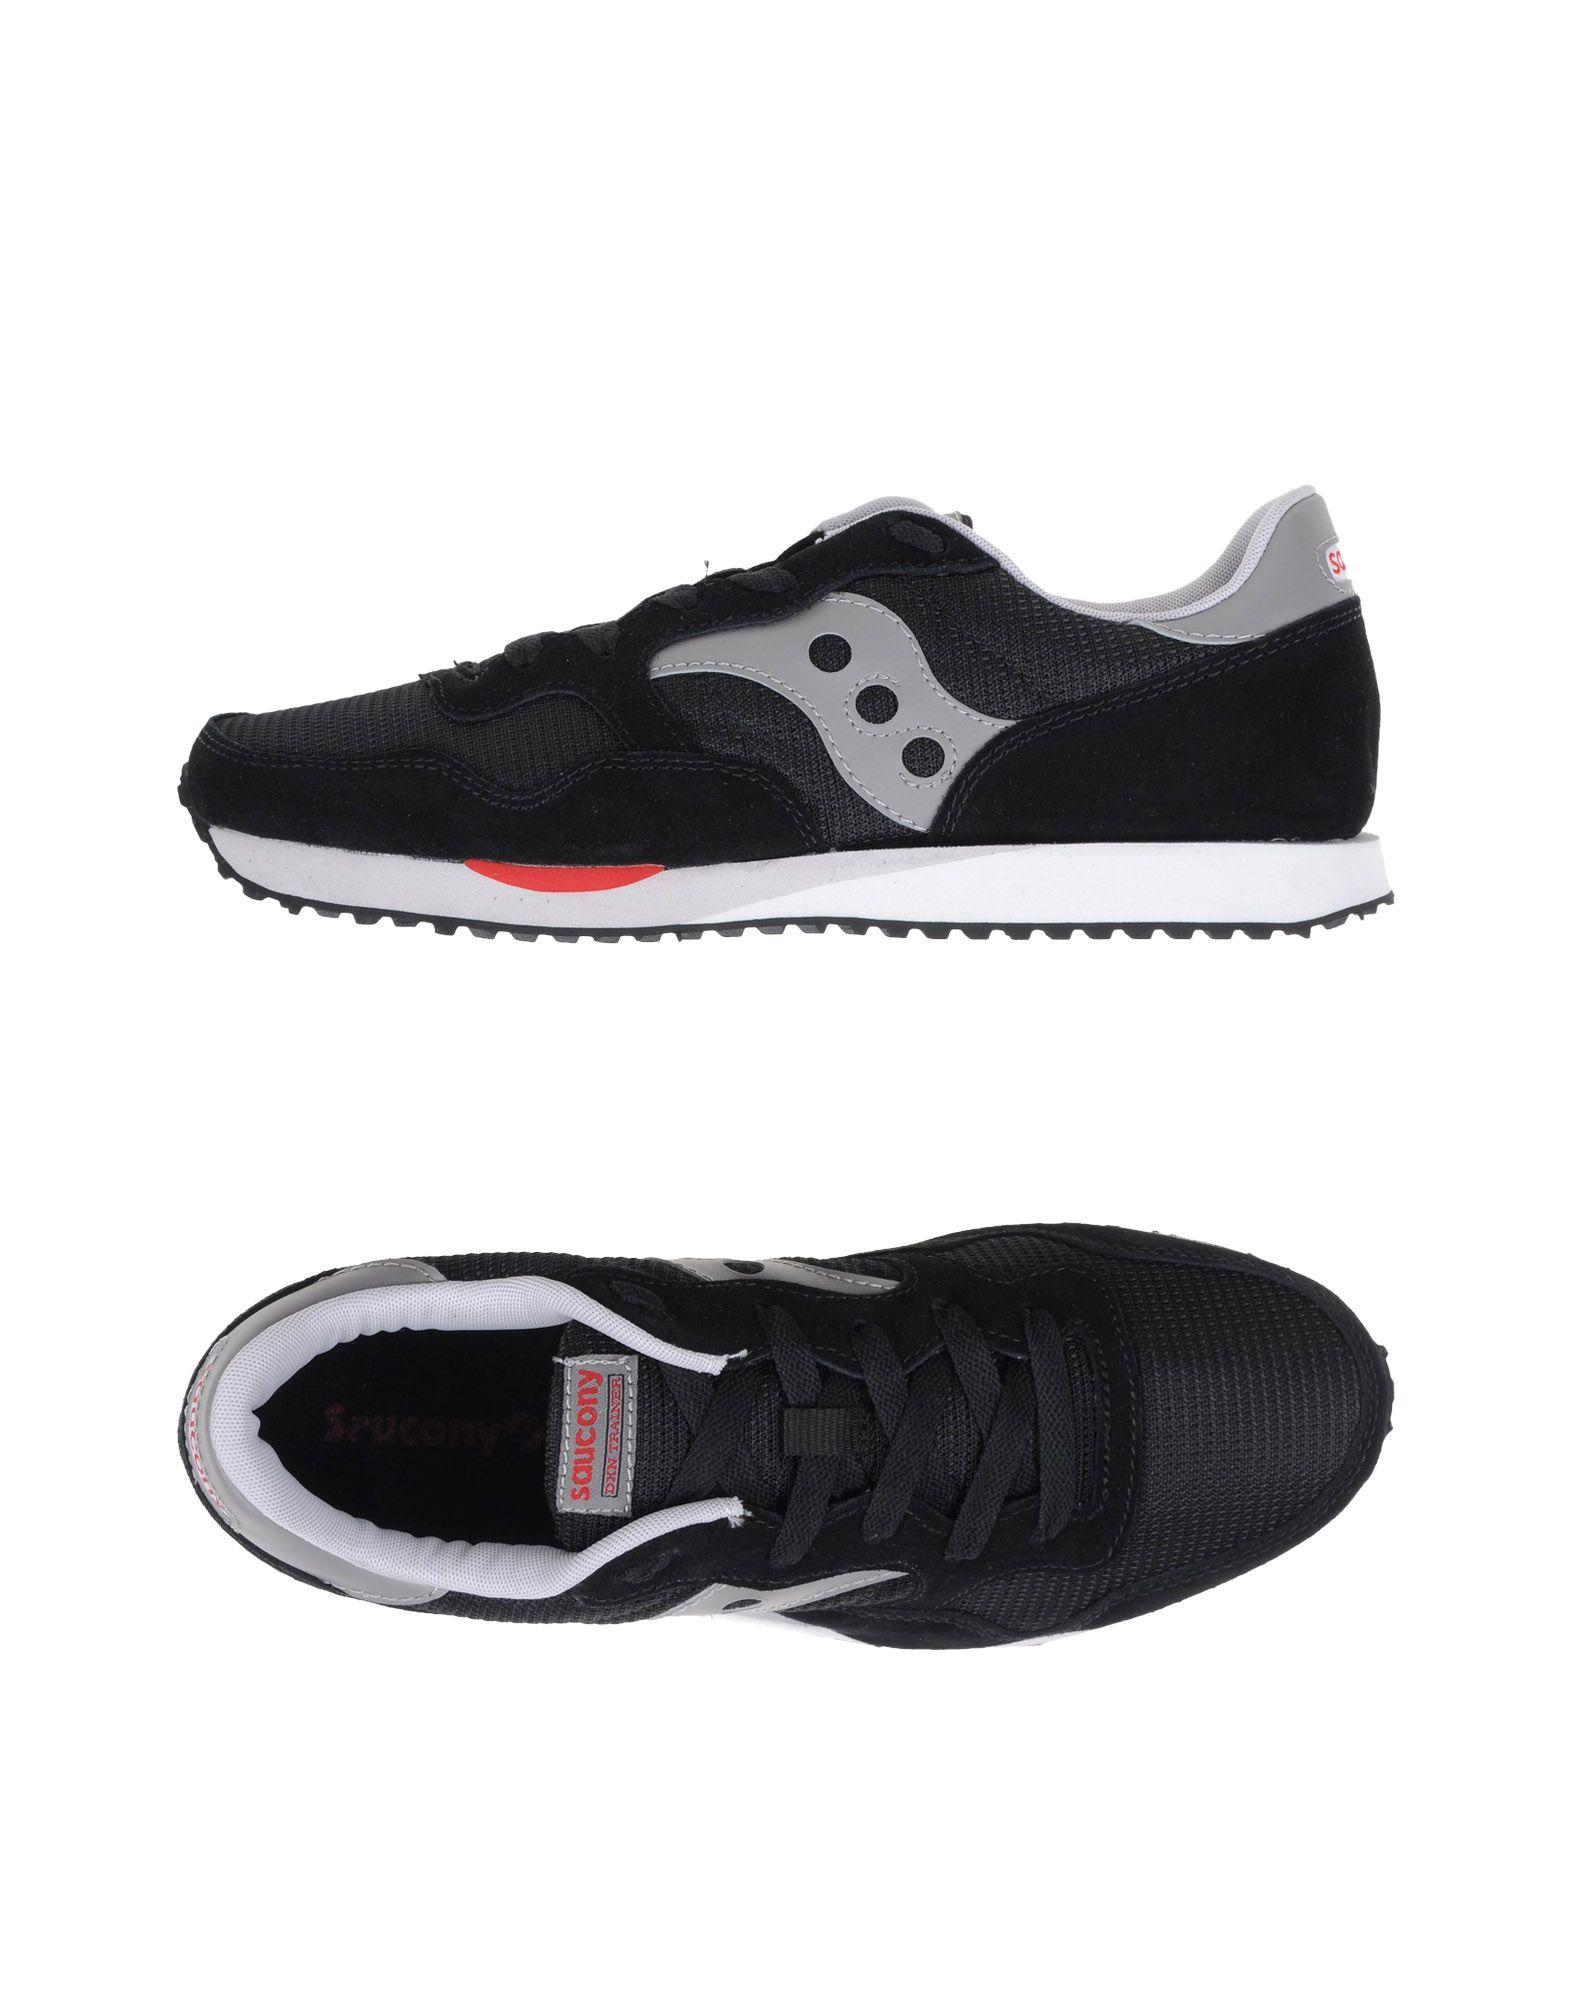 Sneakers Saucony Dxn Trainer - Uomo - Acquista online su